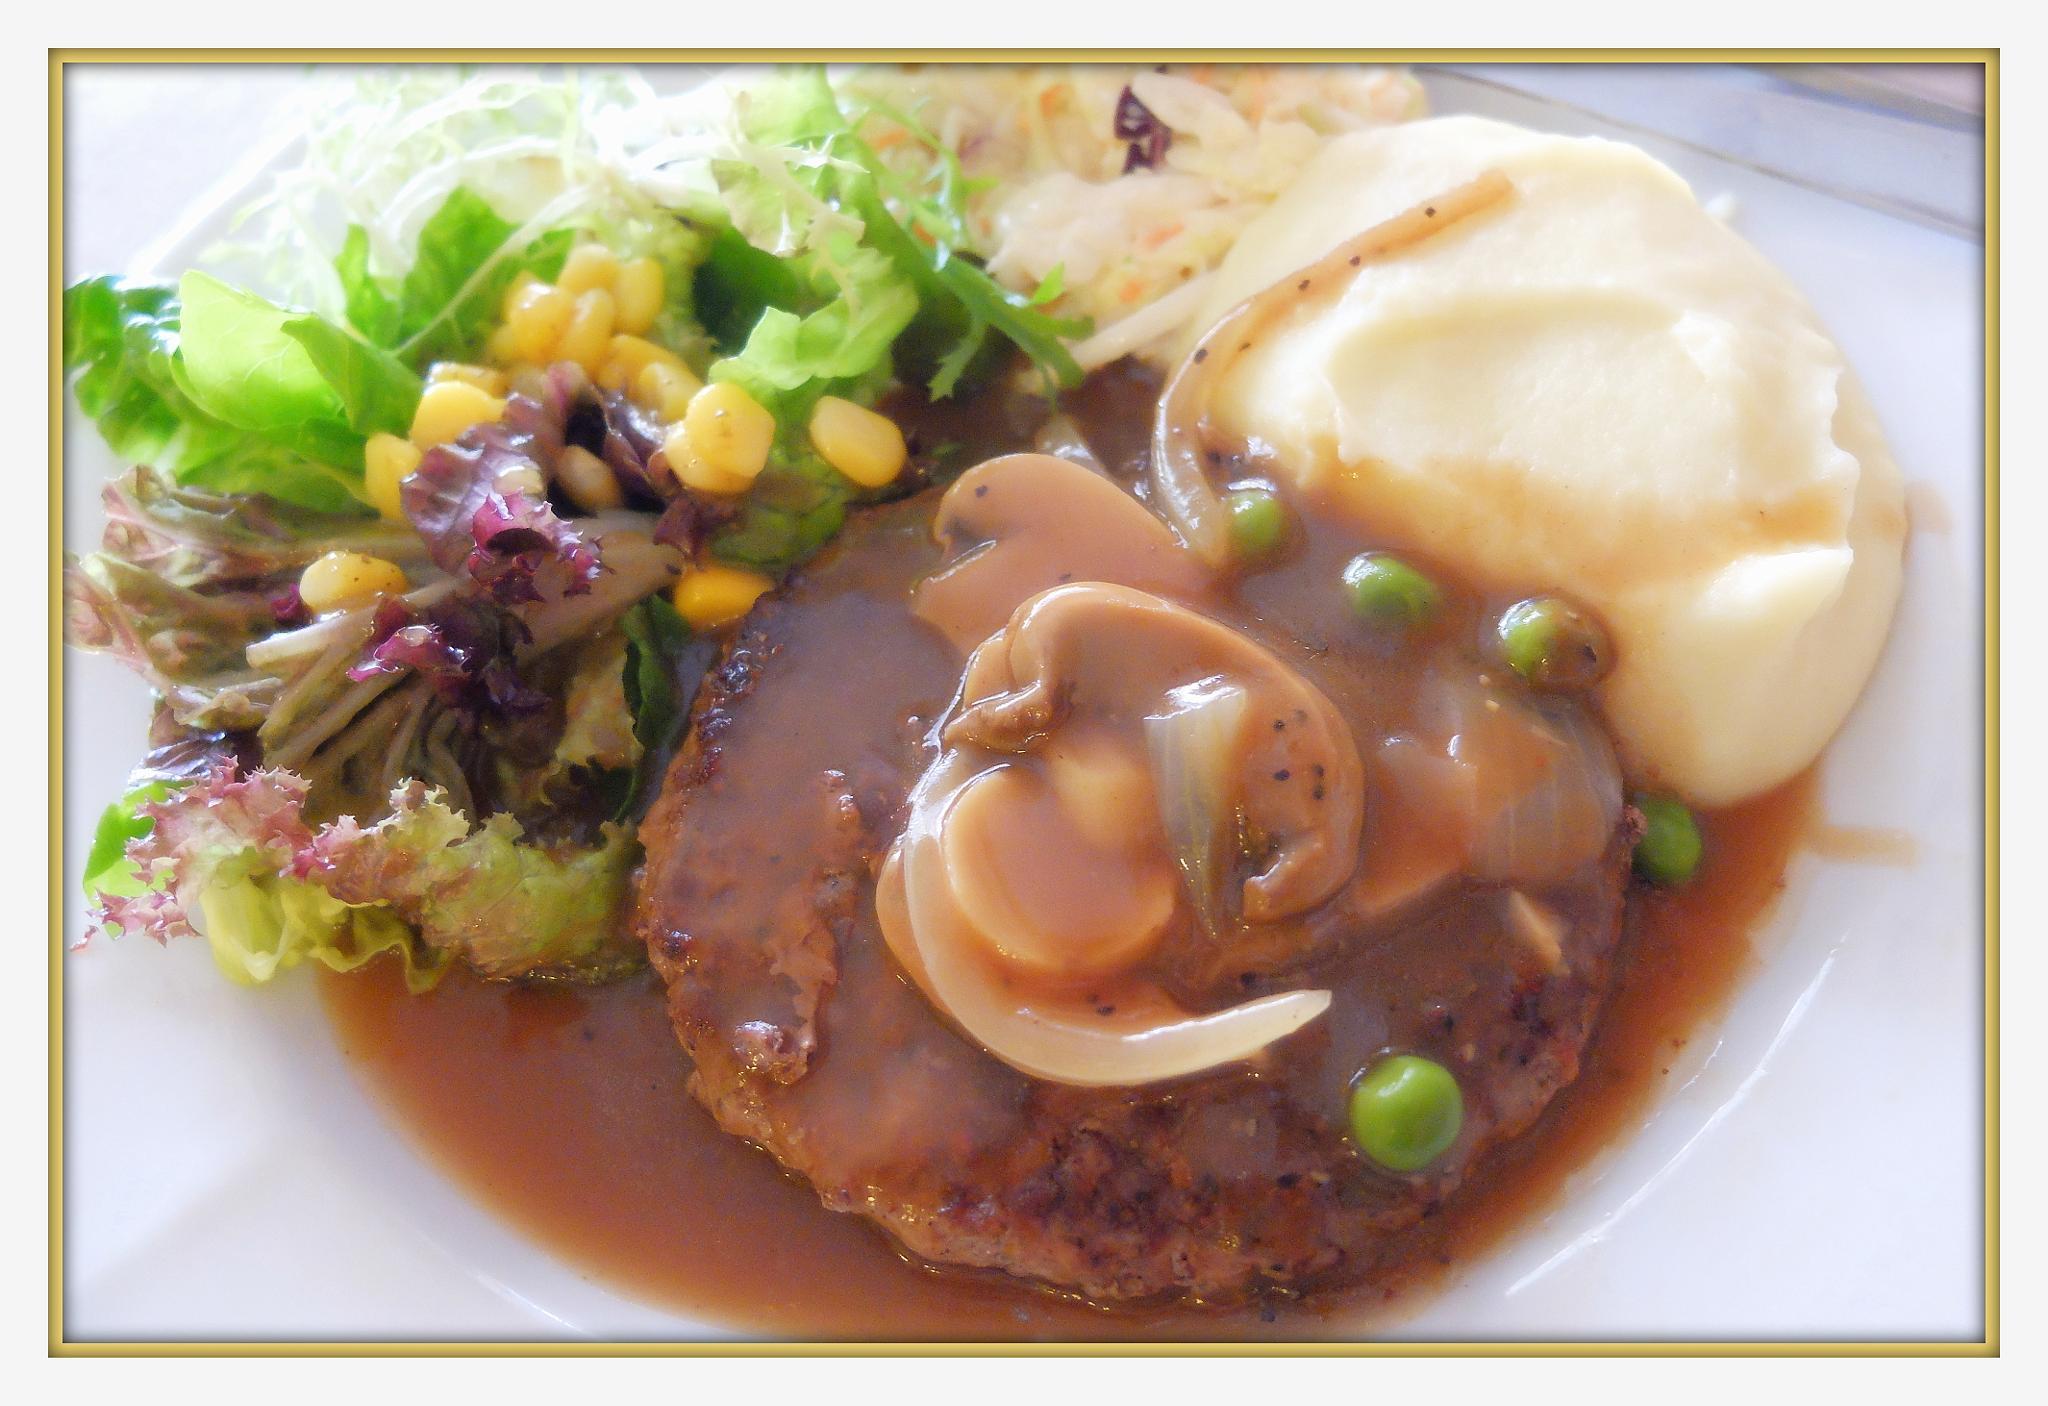 Beef cook in western style by fragranceumlee